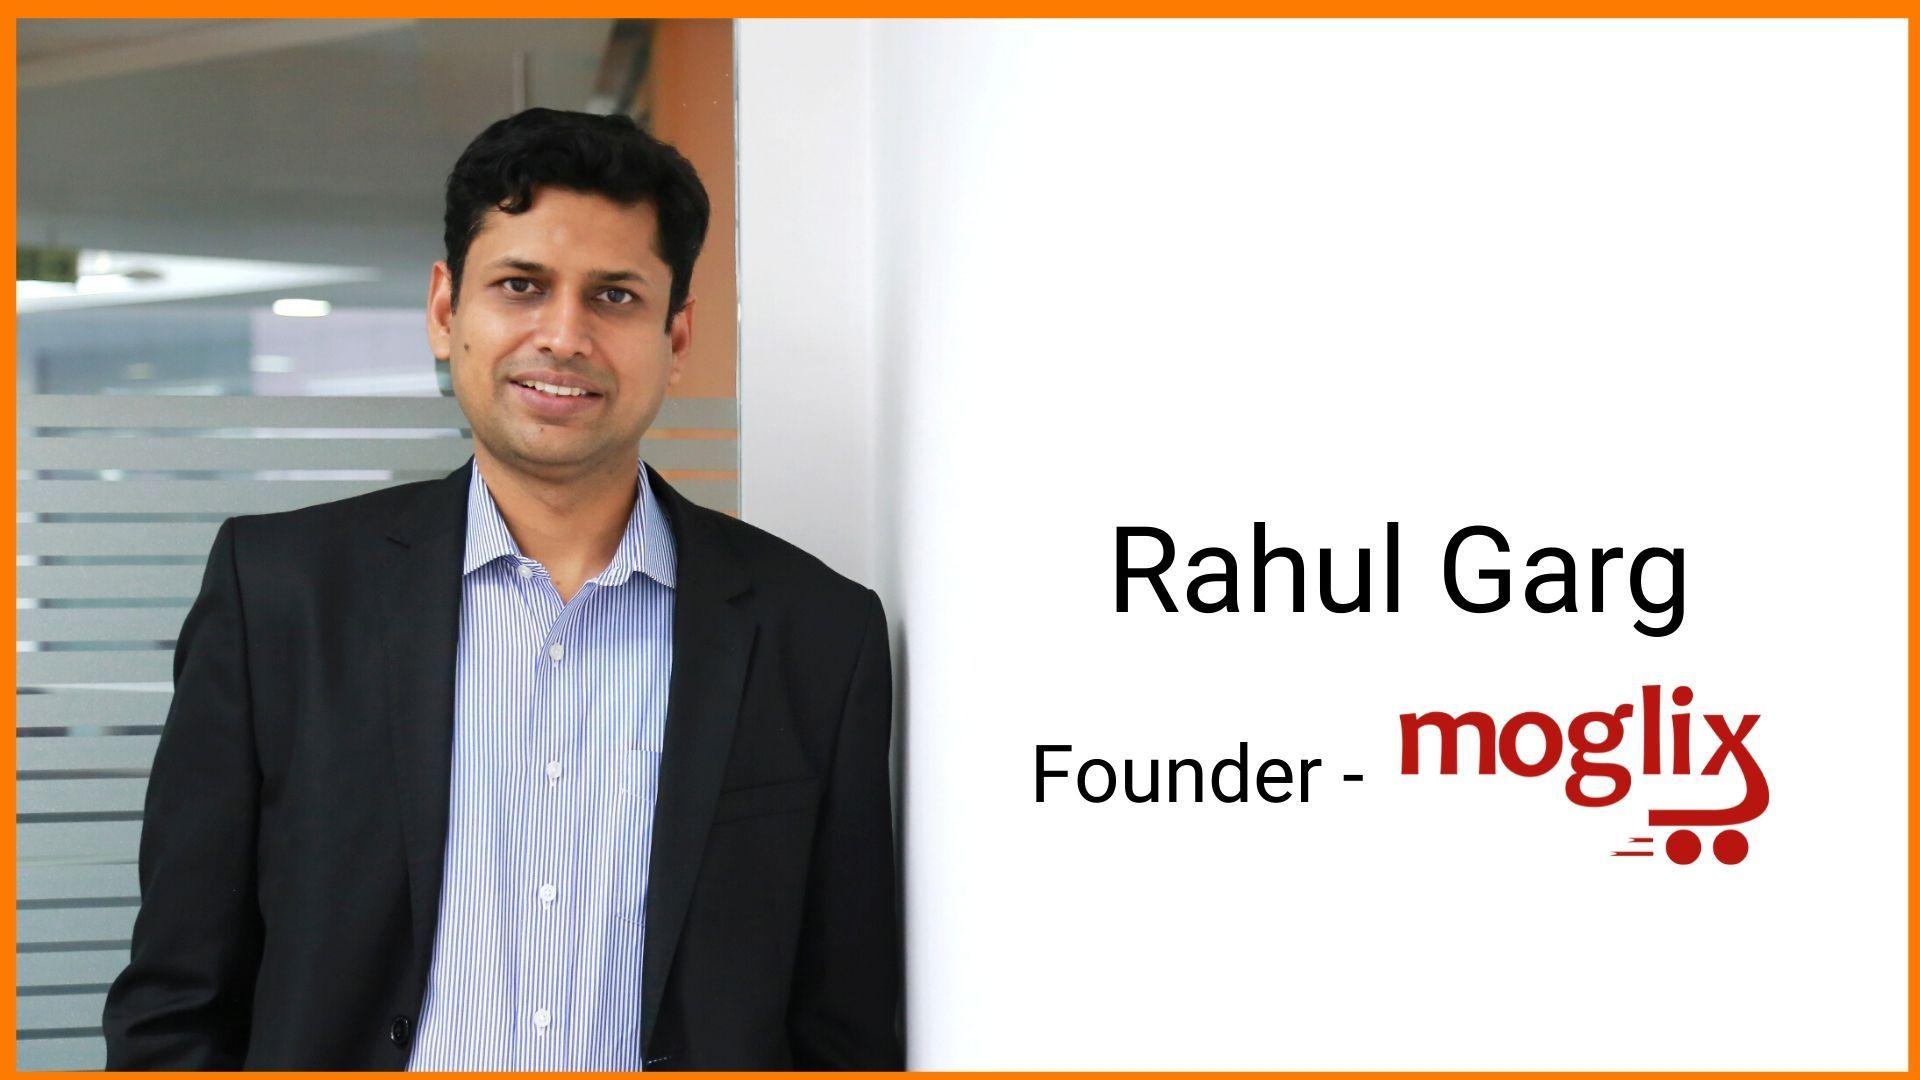 Founder of Moglix, owner of Moglix, CEO of Moglix